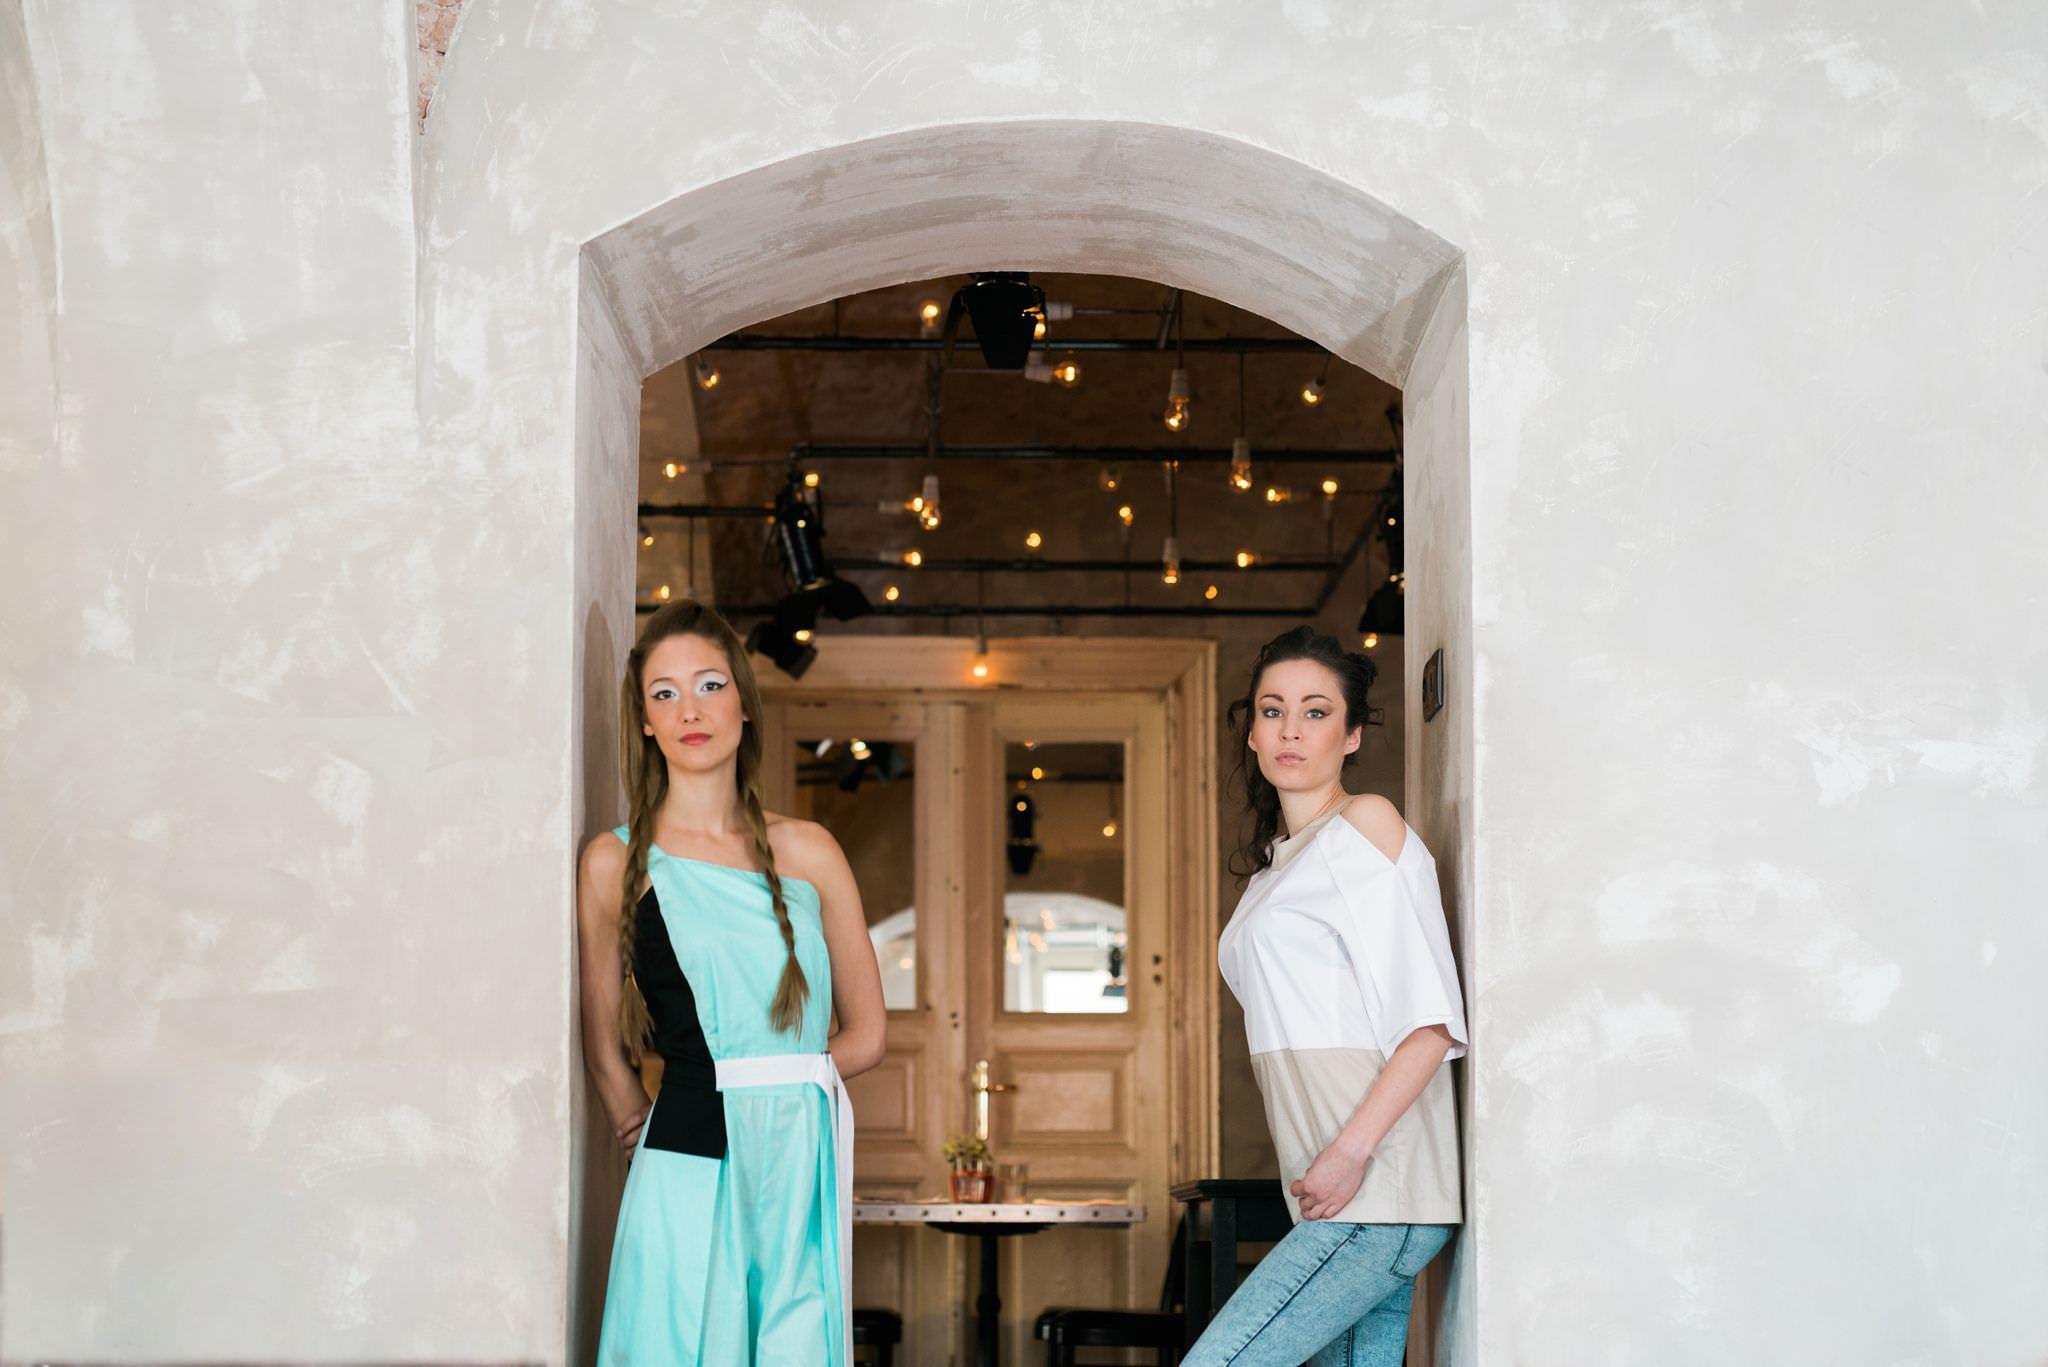 52-Rokolya_Fashion_Editorial_Lookbook_Baltazar_Budapest